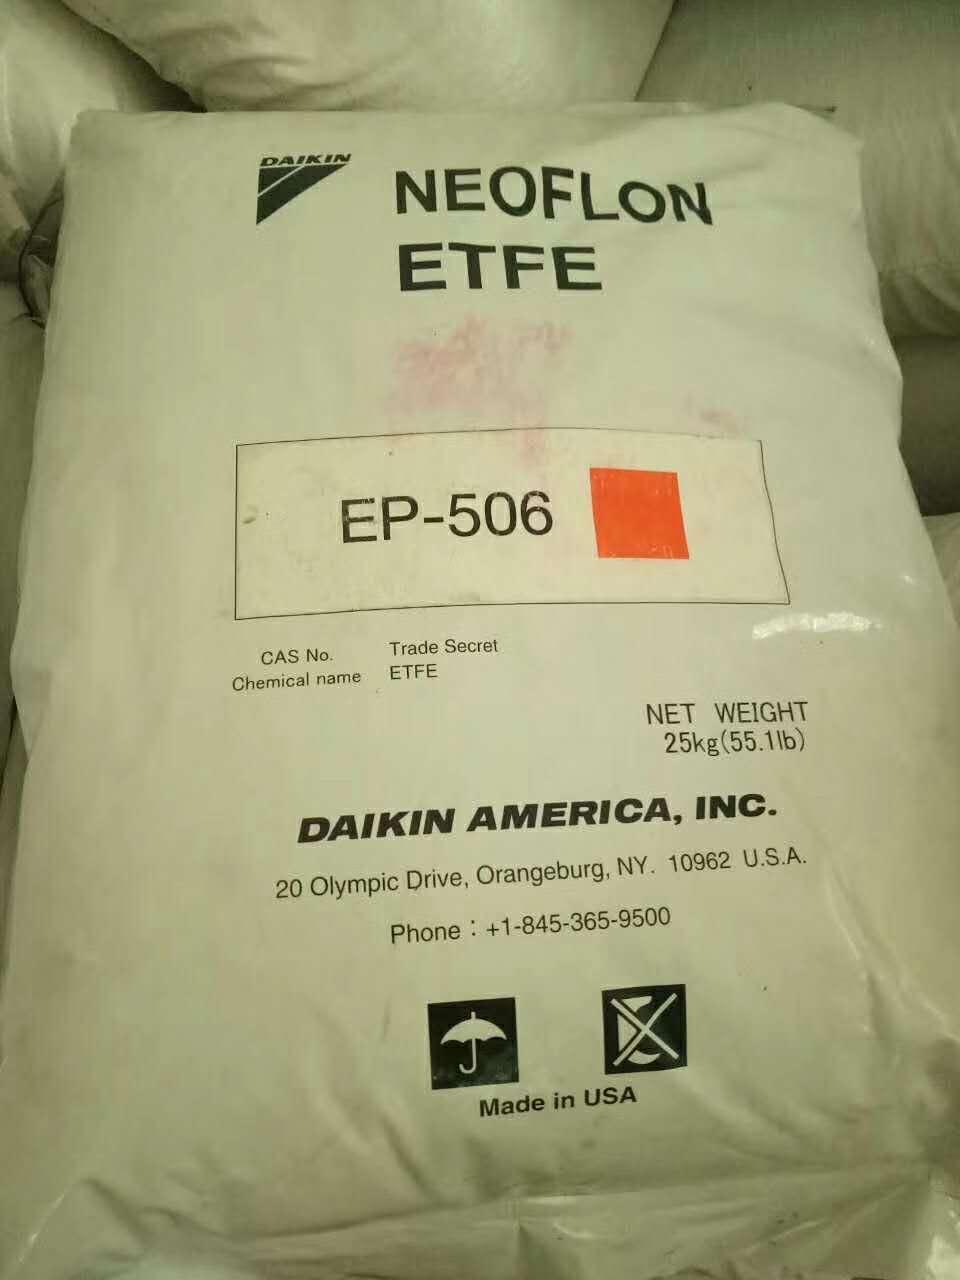 NEOFLON ETFE EP-506